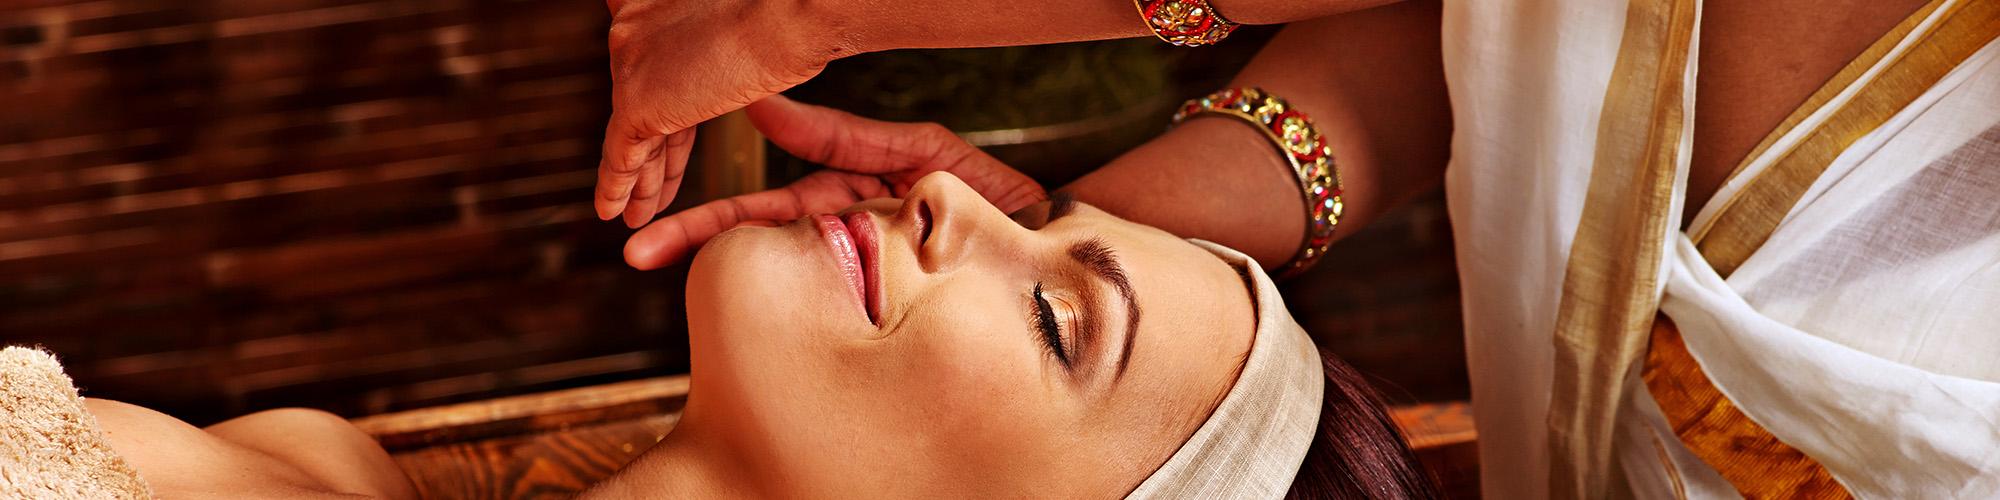 Retraite ayurvédique & yoga au Sri Lanka